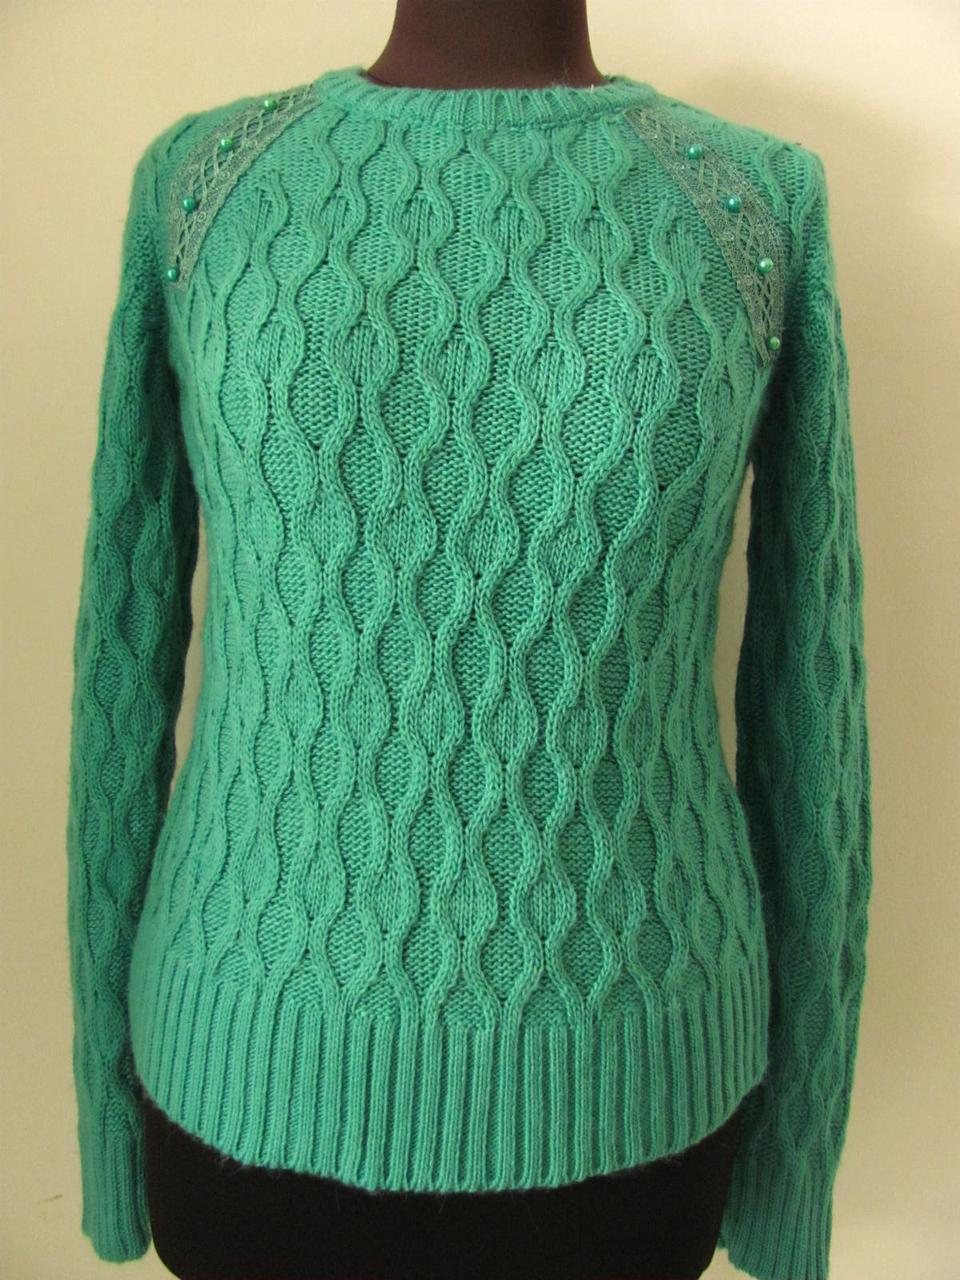 Джемпер женский вязаный, украшен кружевом на плечах, теплый, мягкая пряжа, размер 42-48, код 2434М